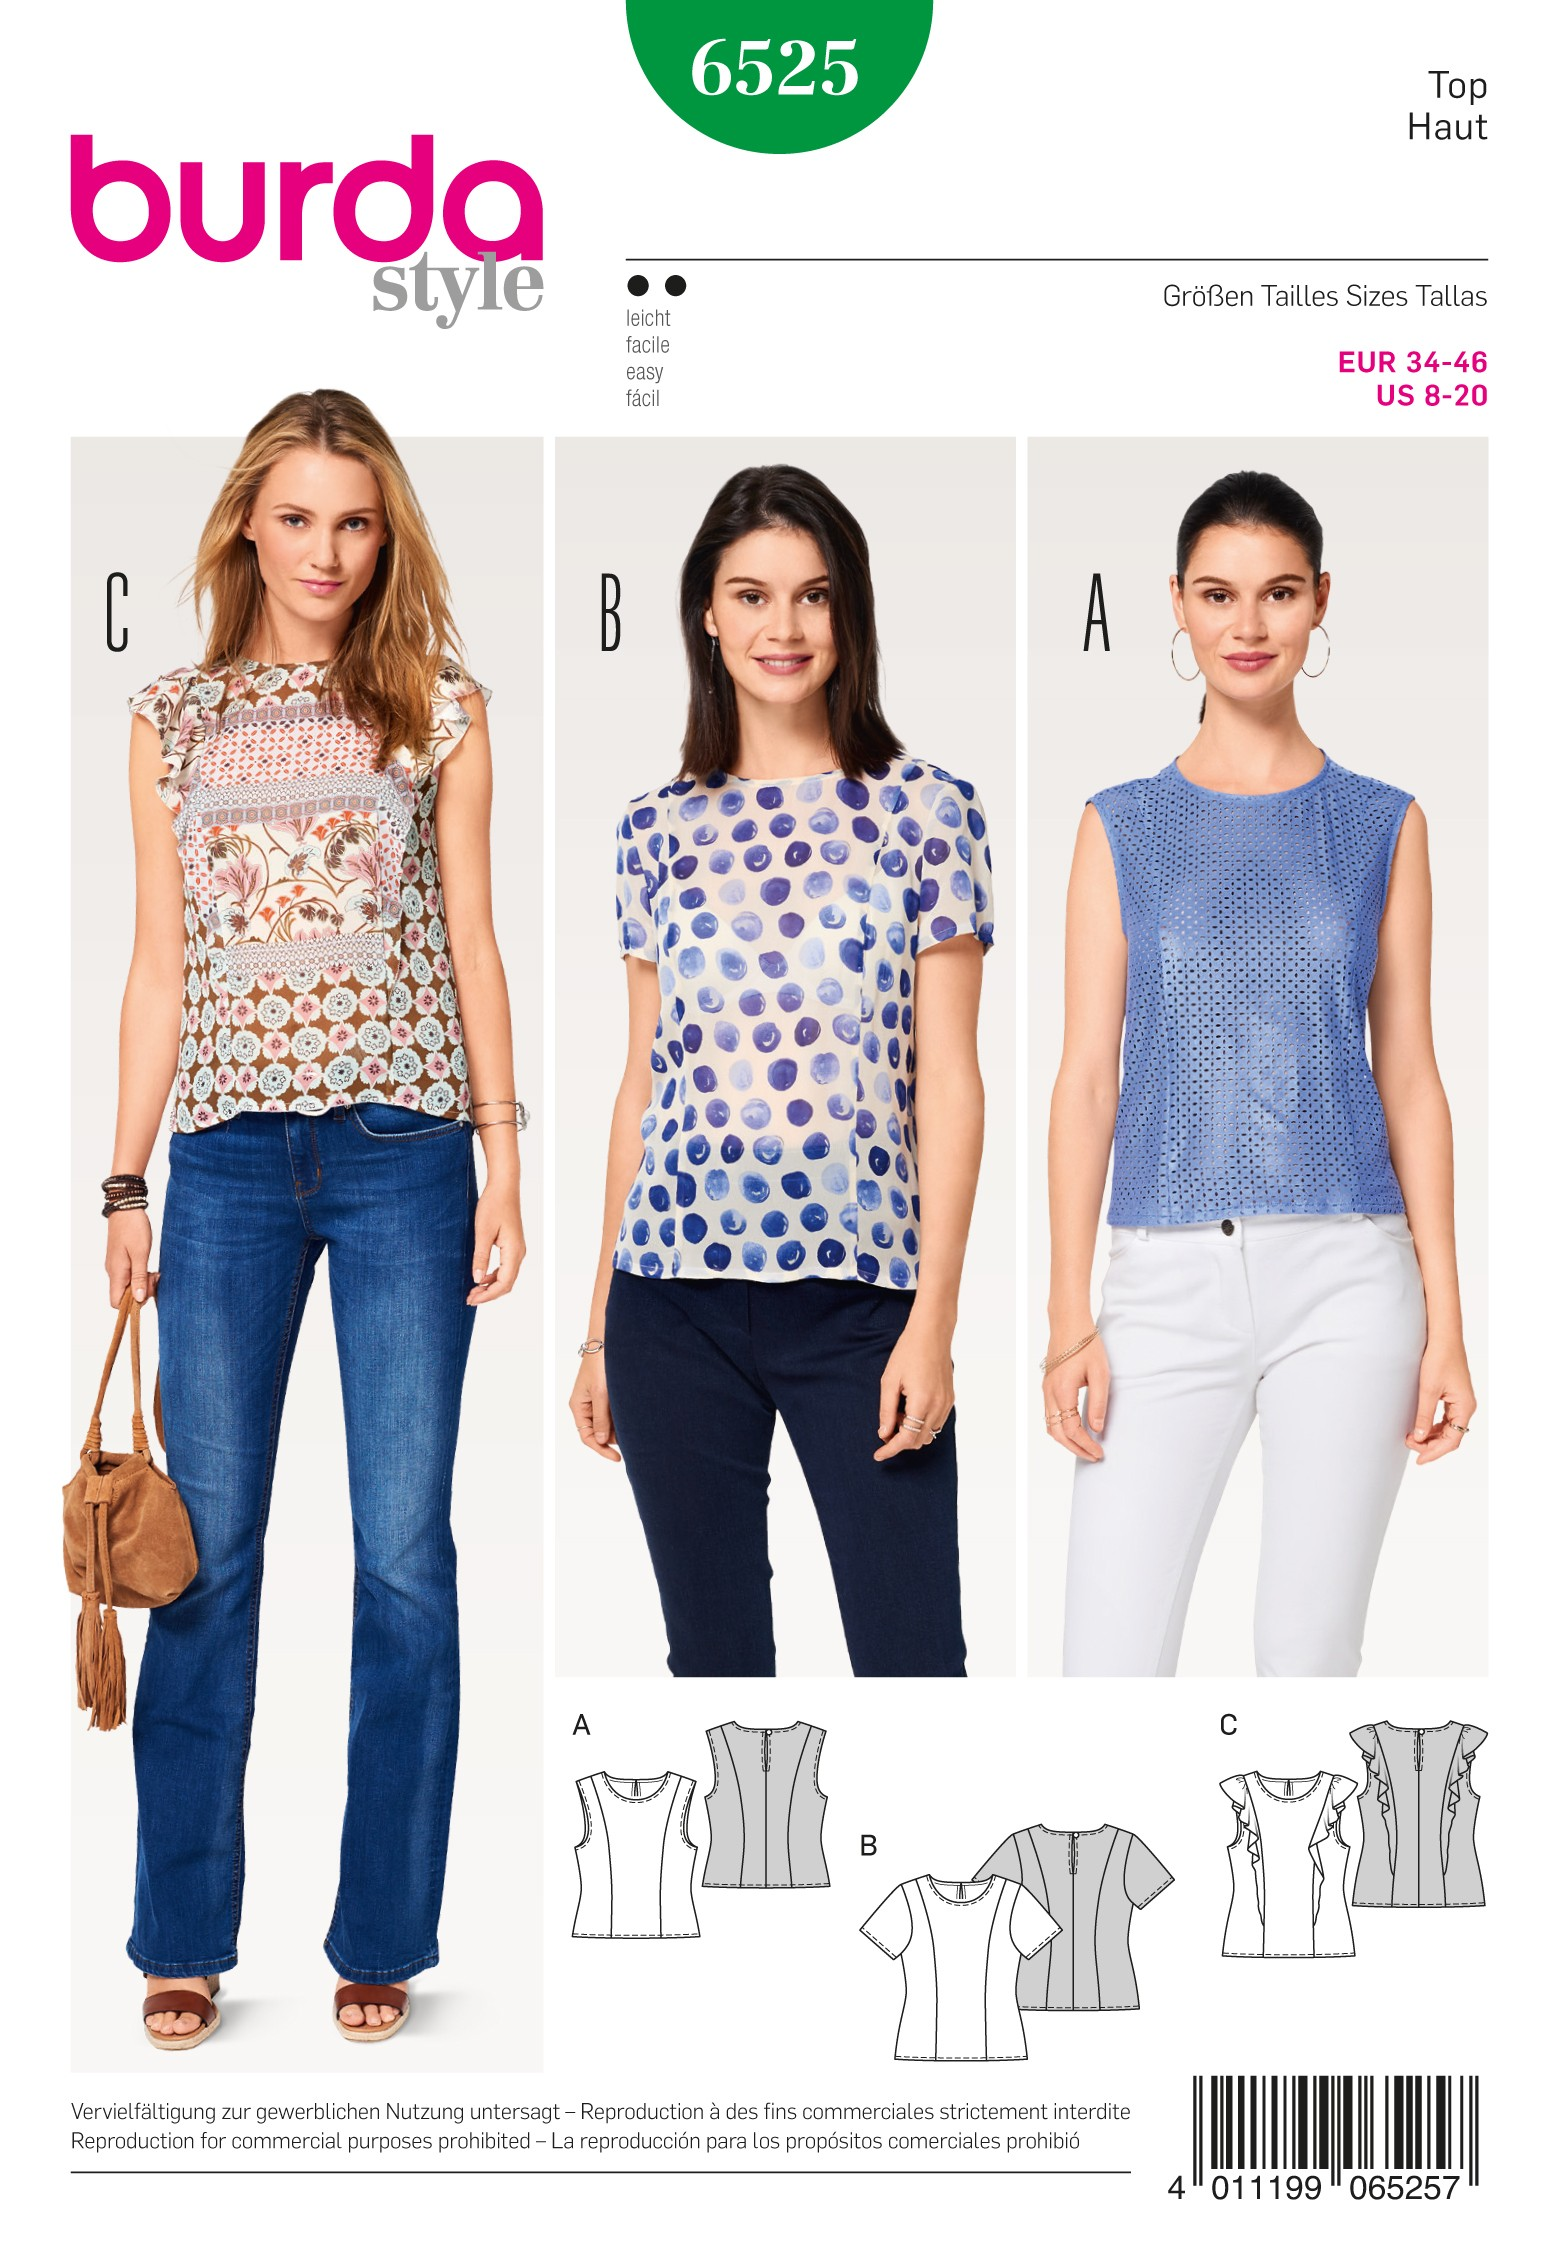 Burda Sewing Pattern 6525 Style Women's Misses' Blouse Size 8-20